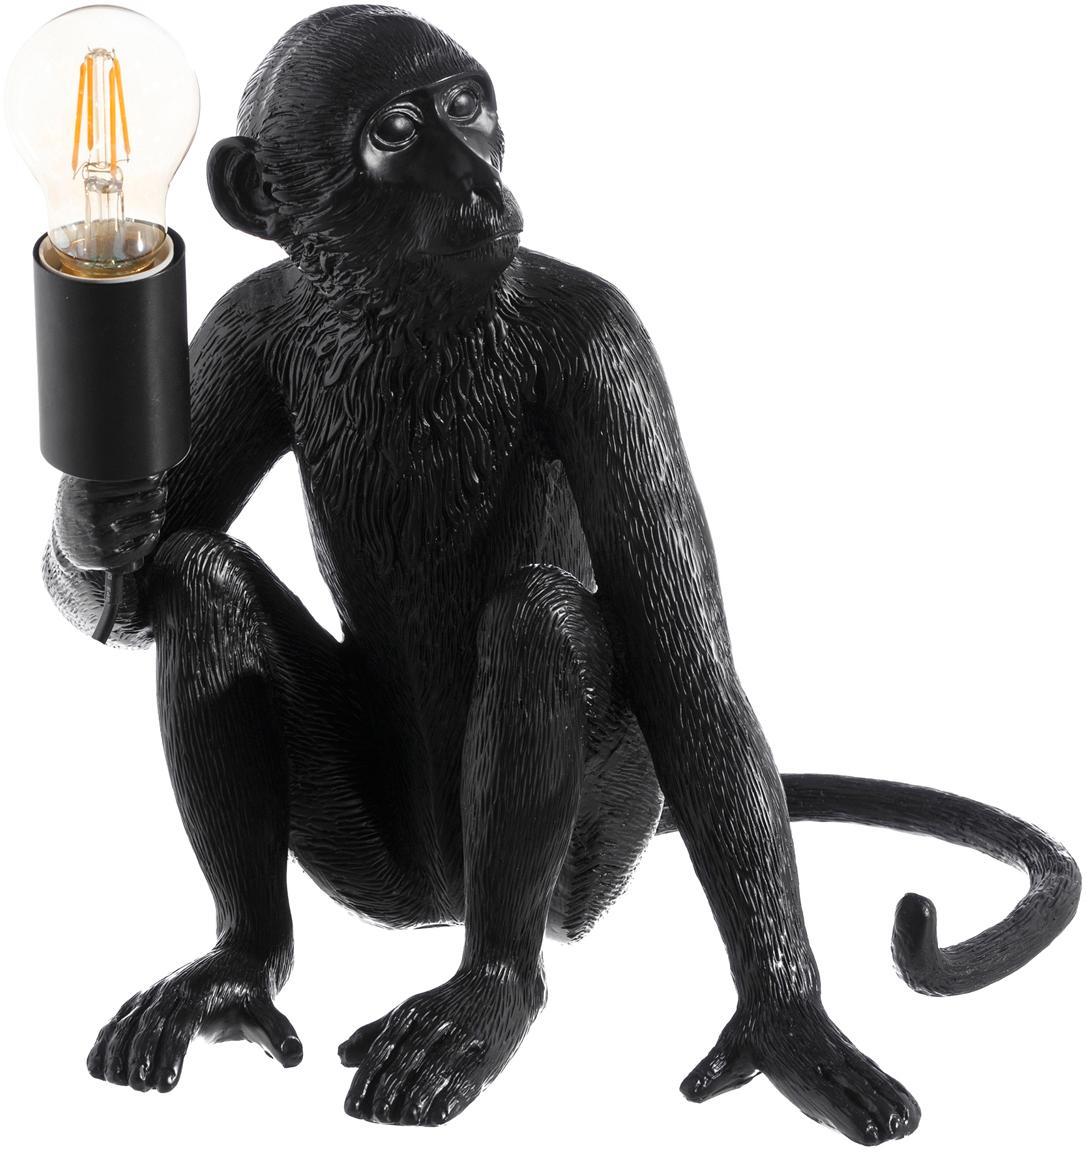 Lampada da tavolo Monkey, Poliresina, Nero, Larg. 31 x Alt. 31 cm